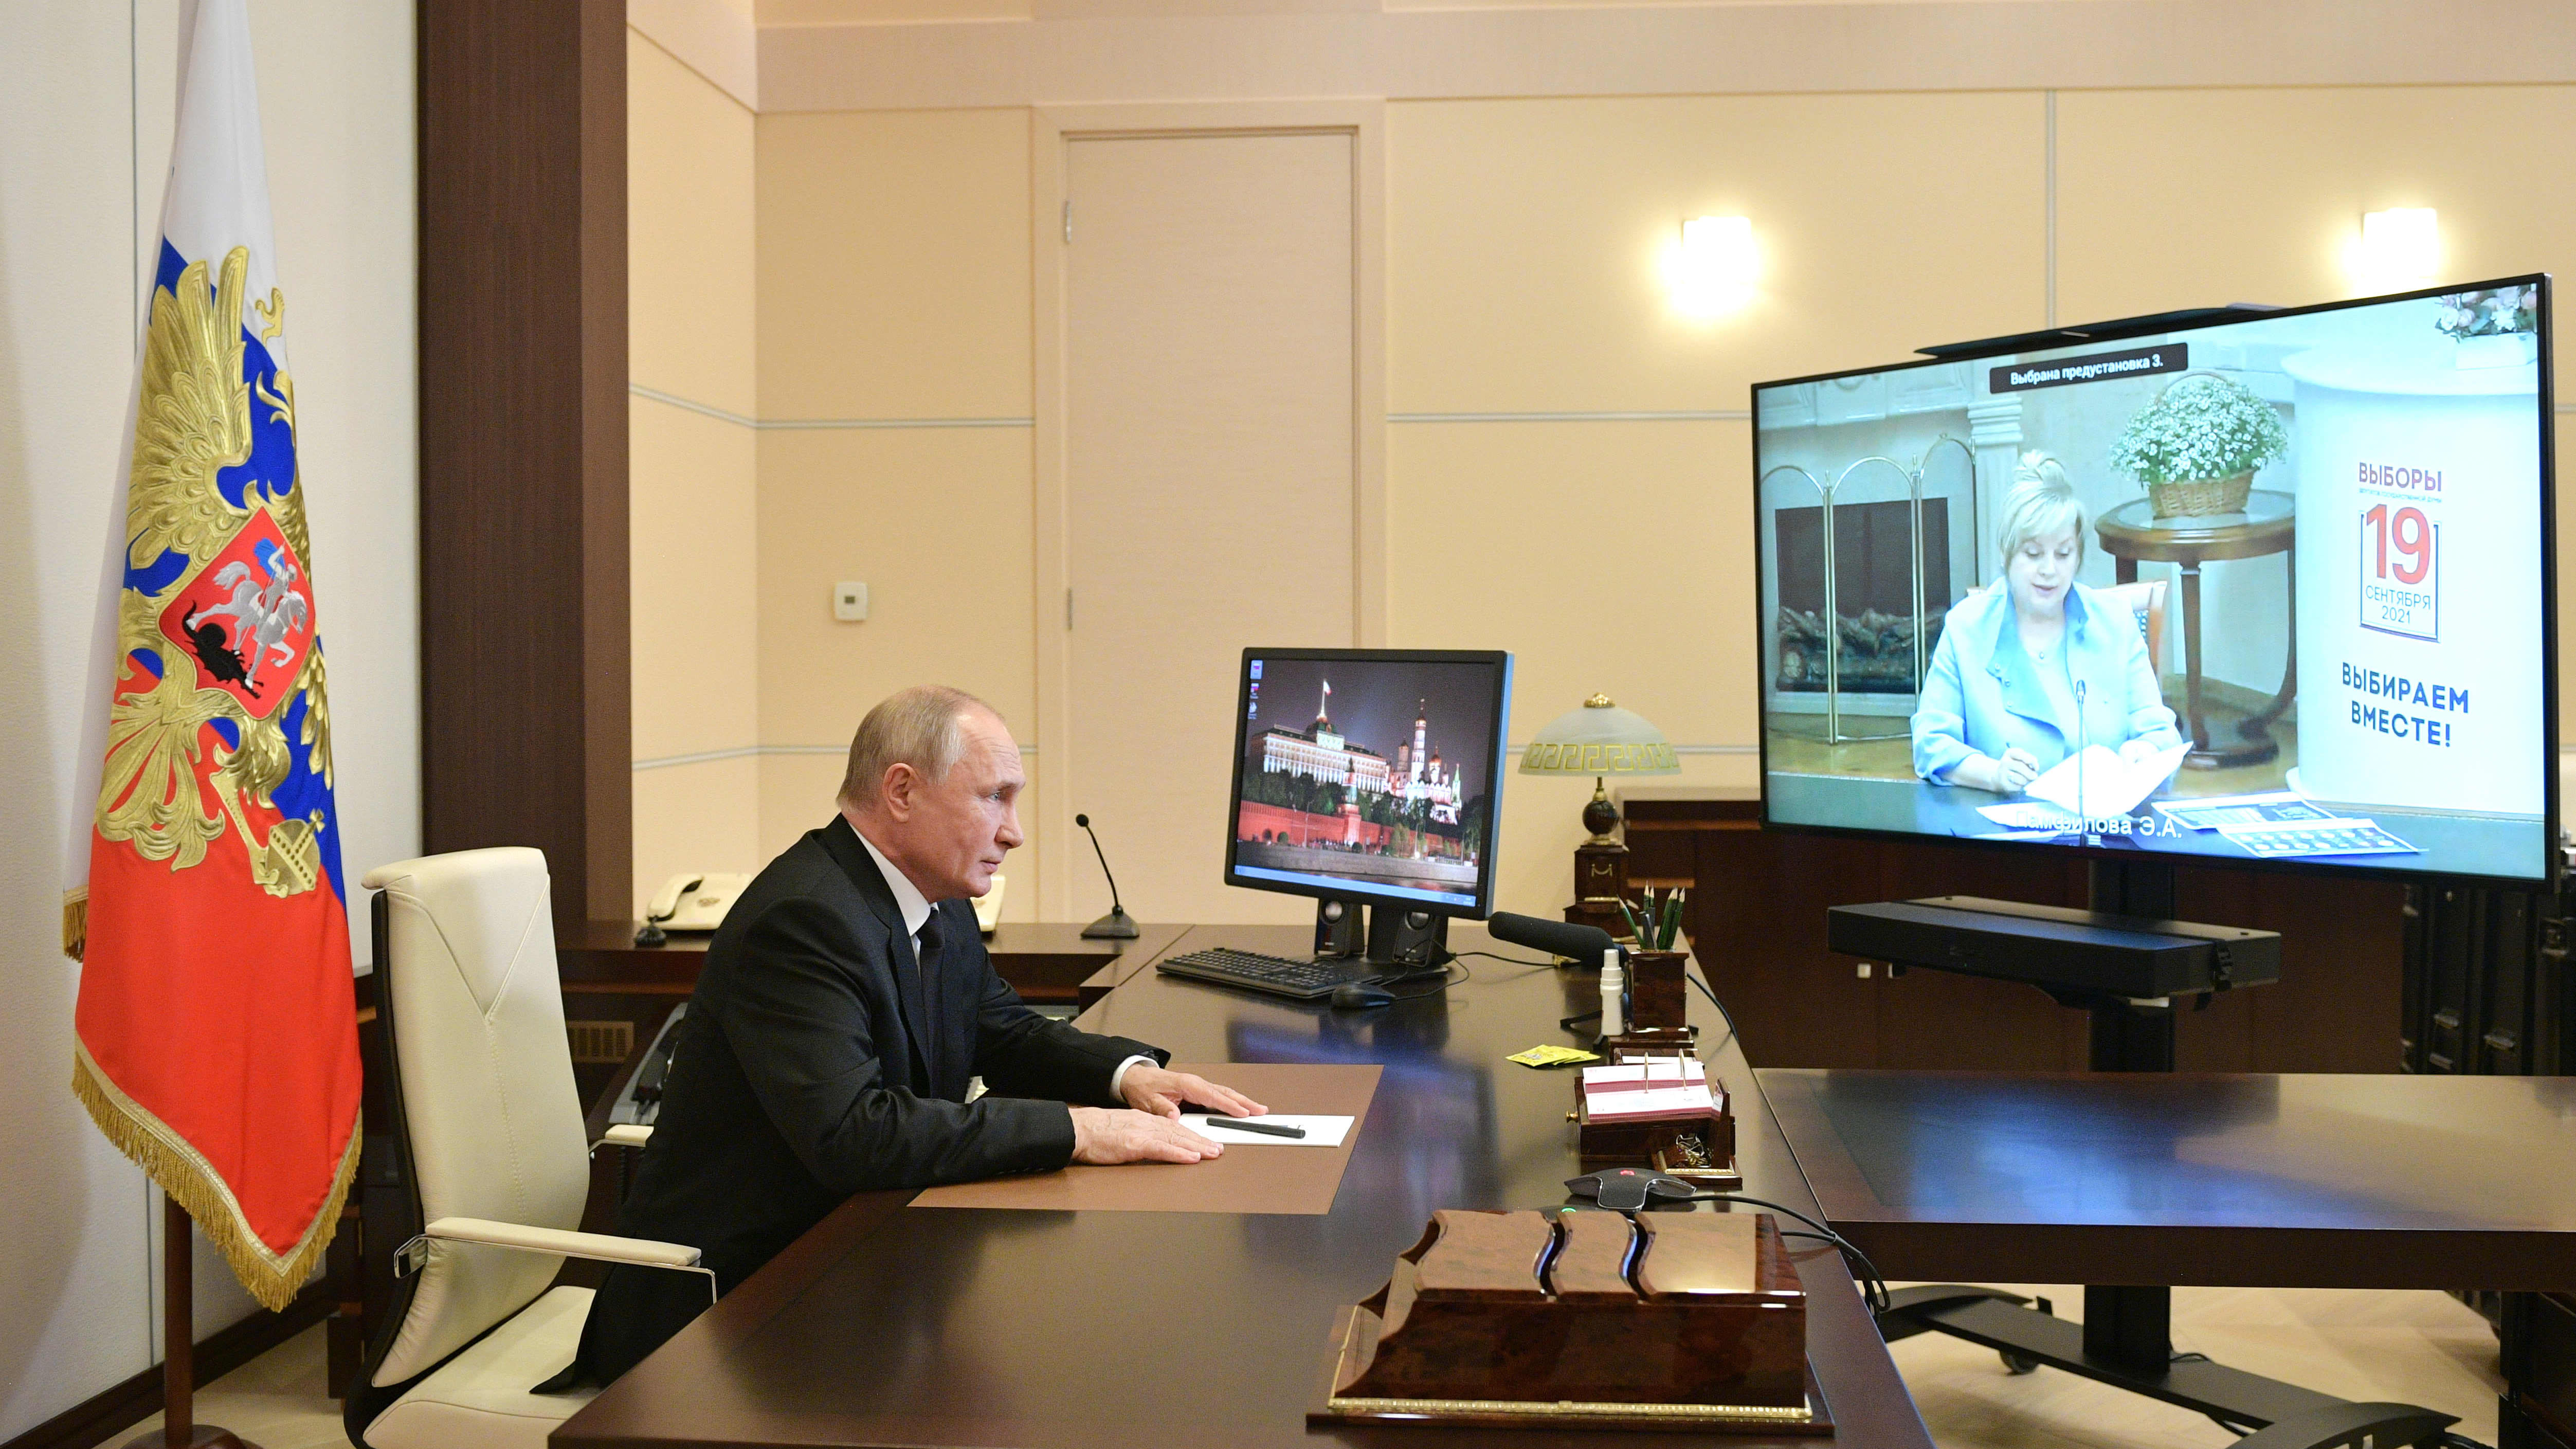 Vladimir Putin videokokouksessa.